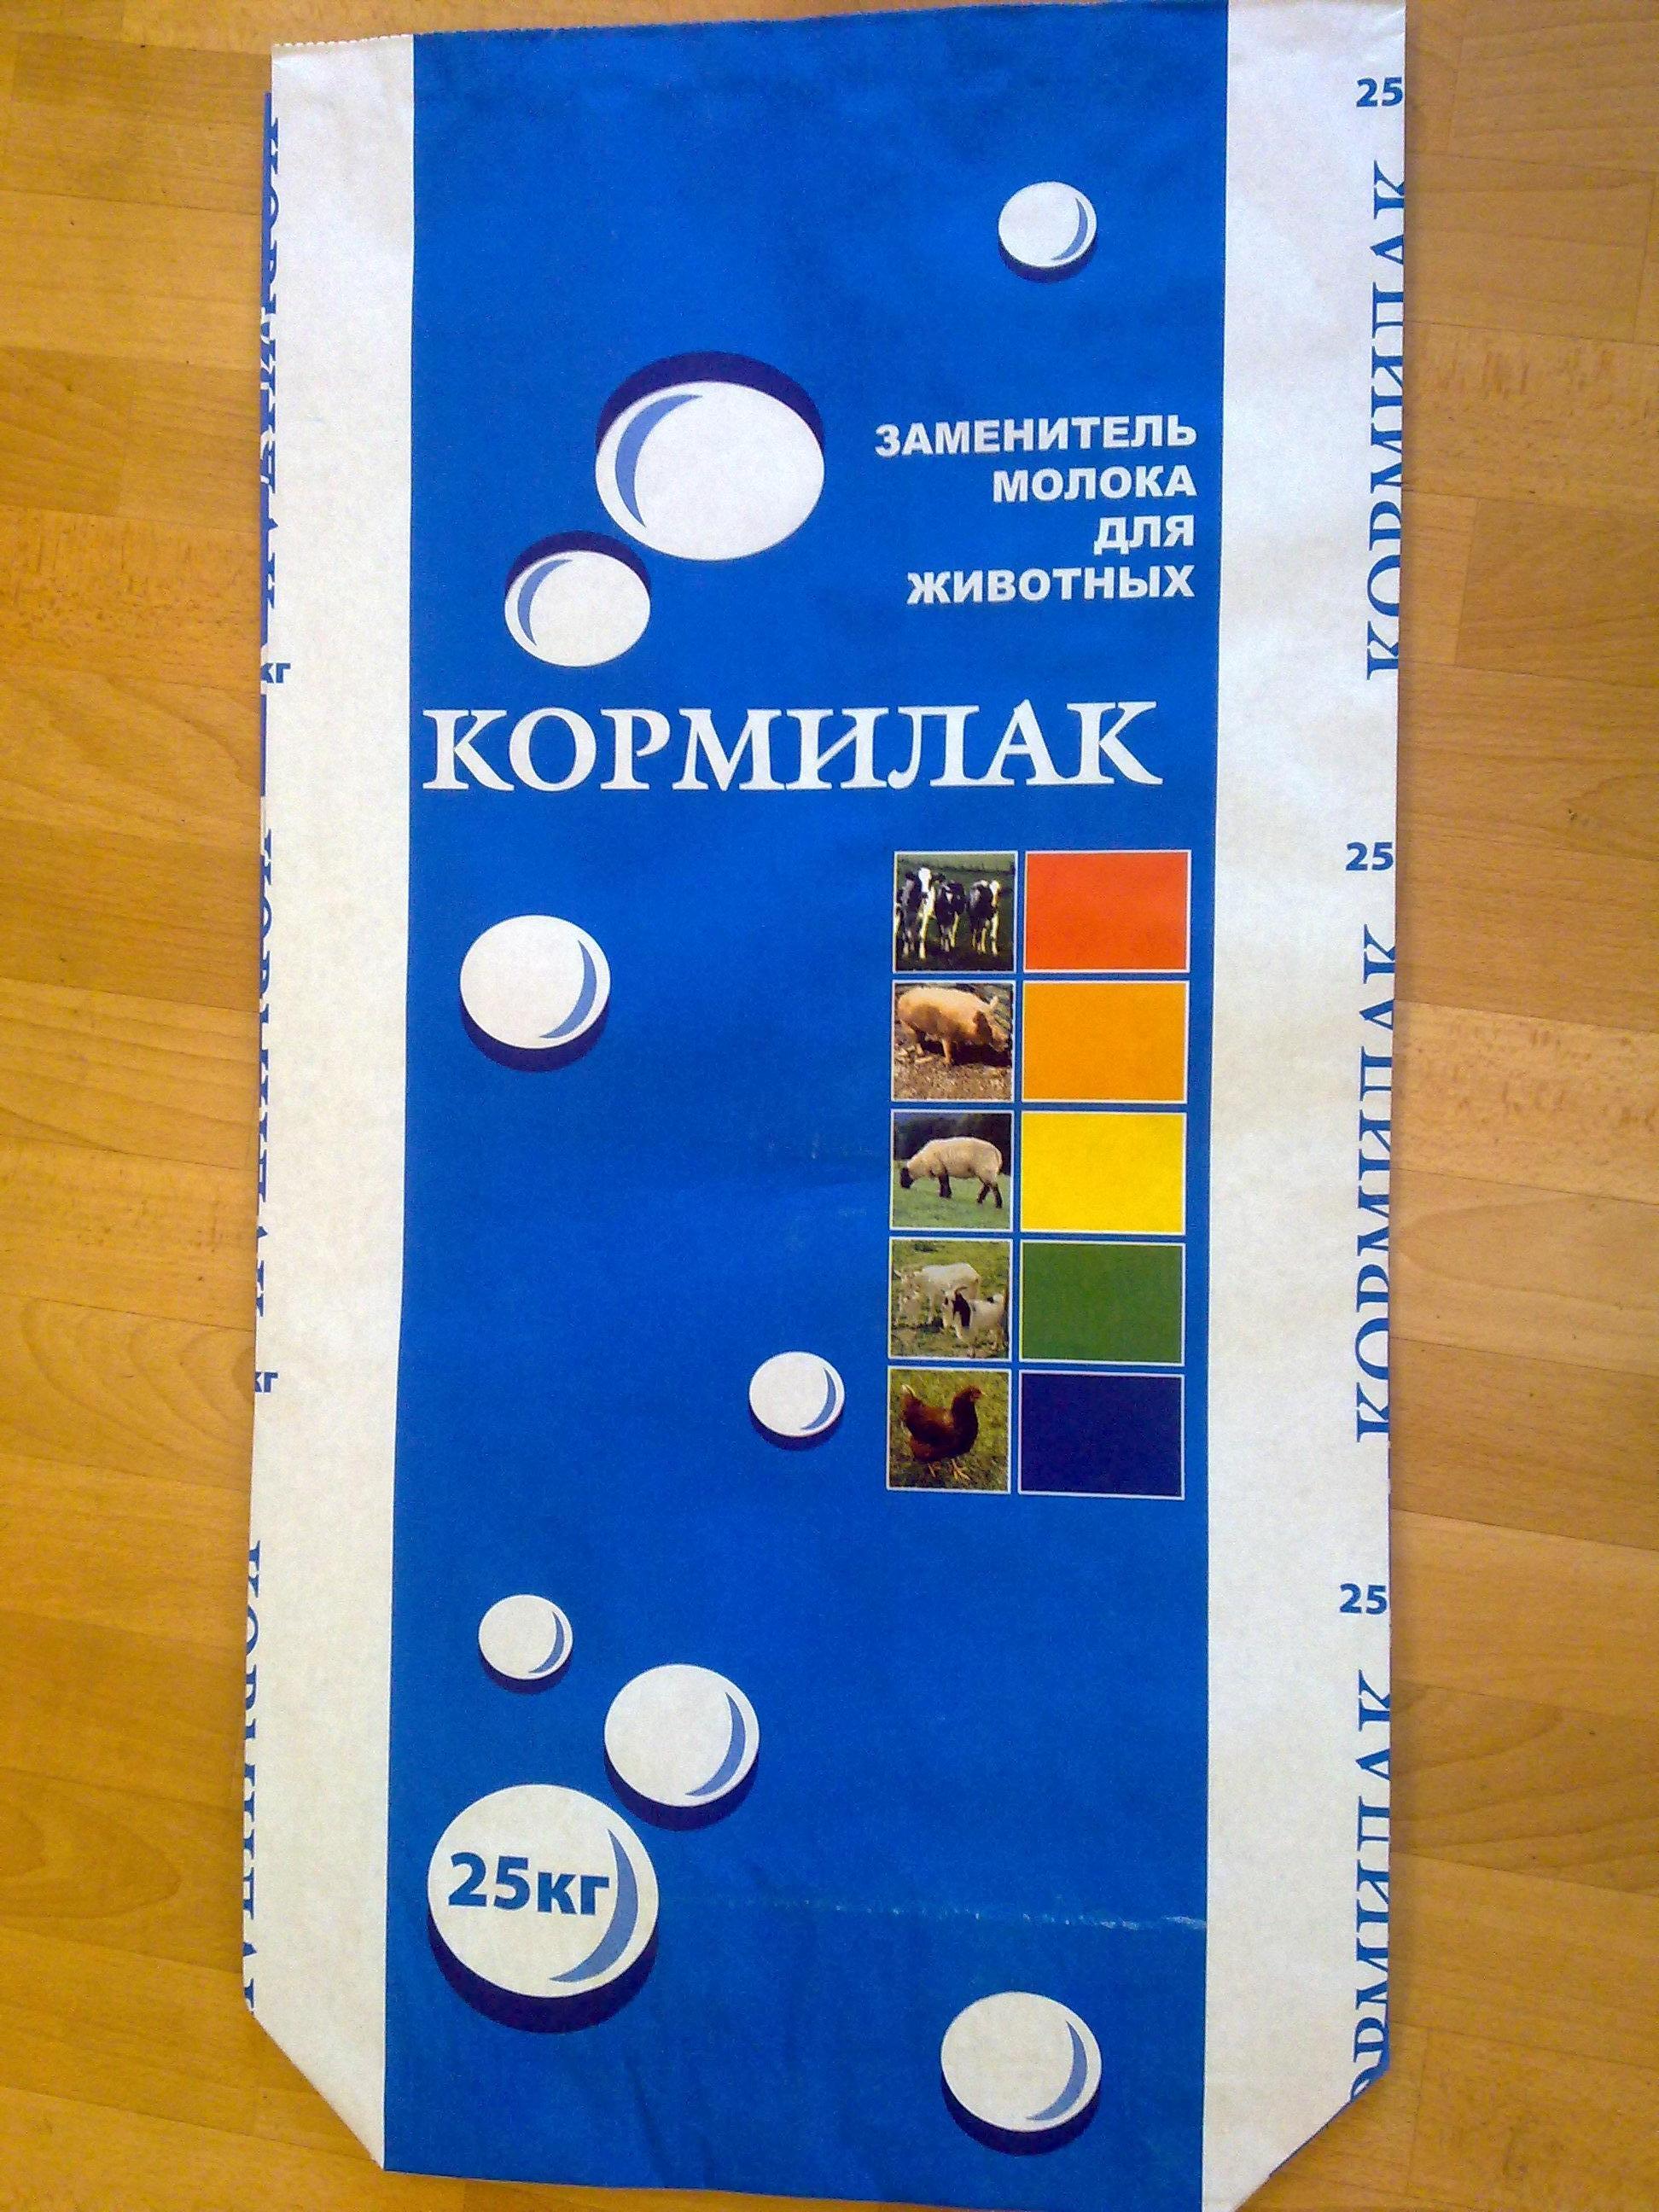 kormilak-1216-1chast